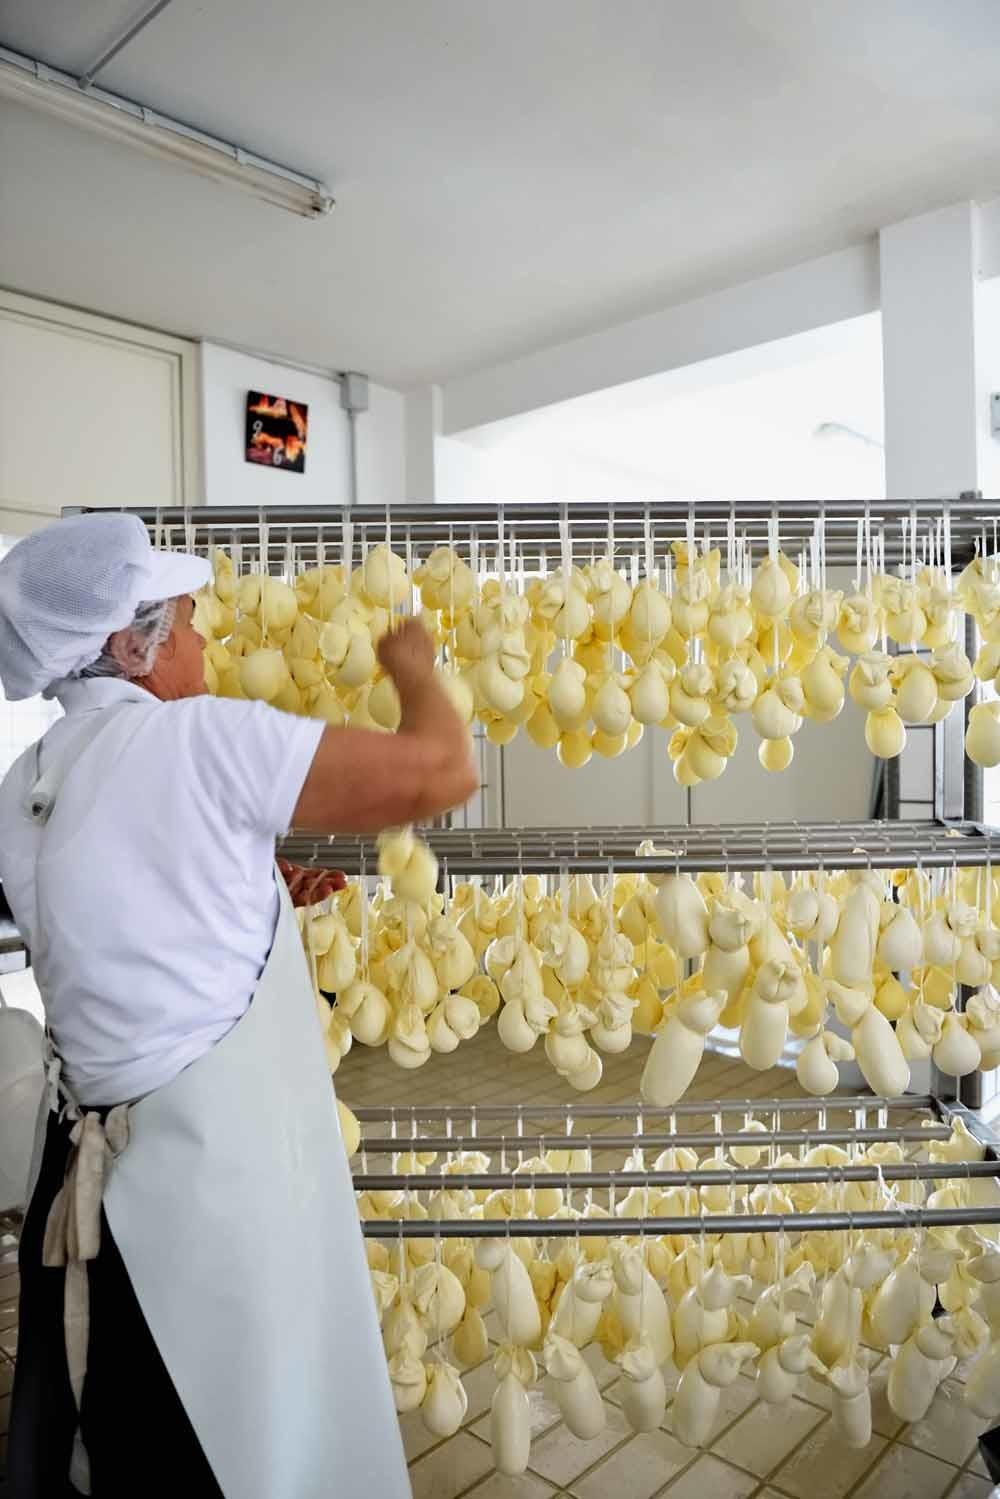 Een mozzarellafabriek in de provincie Isernia.  – © Franco Cogoli / HH